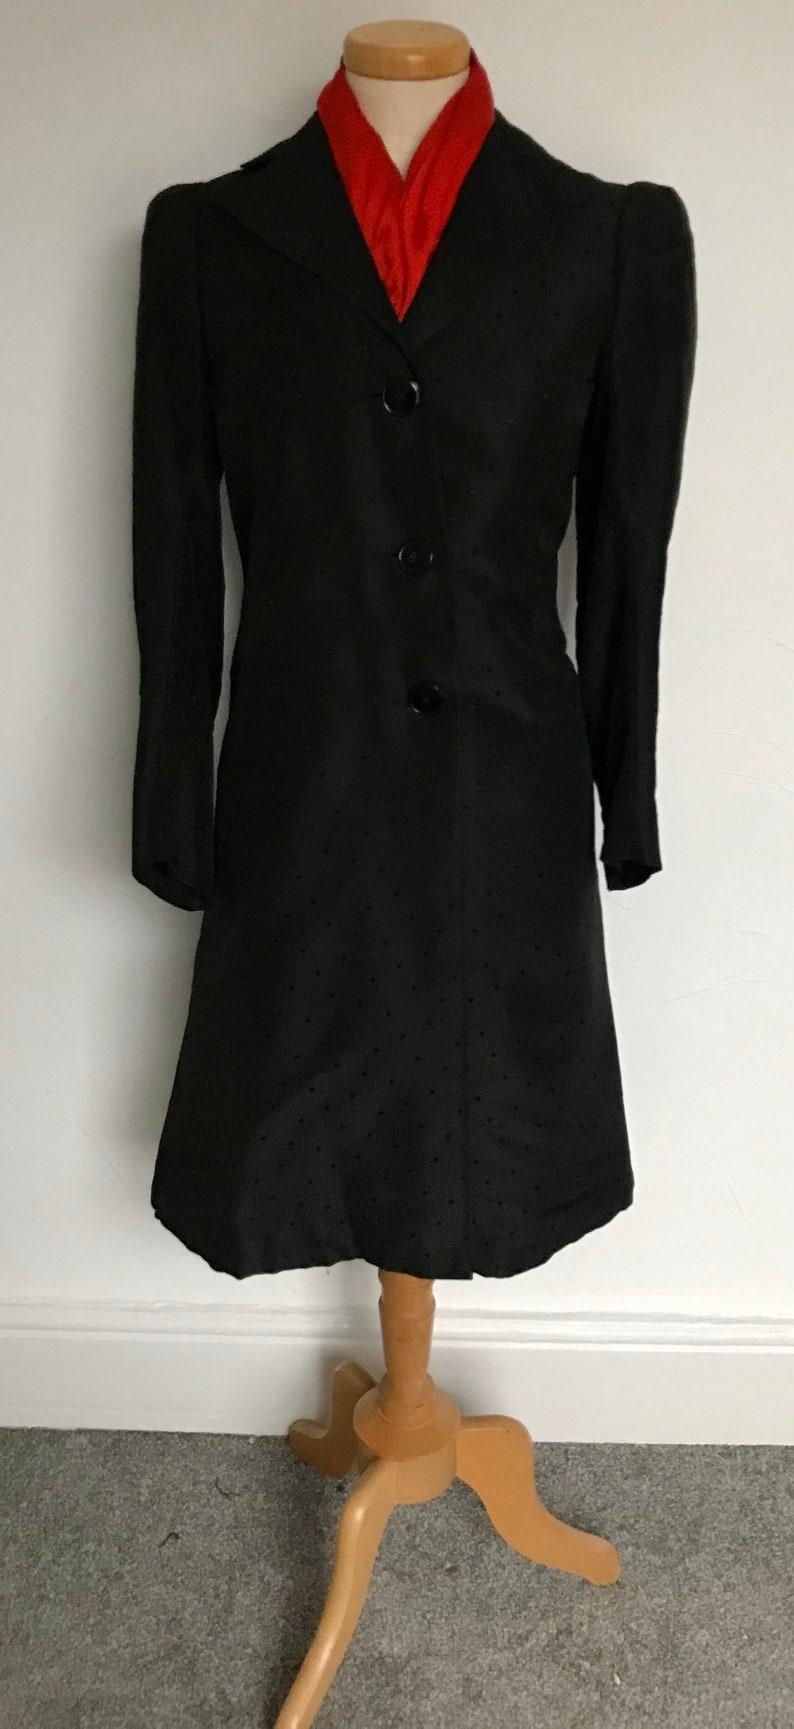 Stunning Vintage 1940s Princess Coat Dress Black Silk Brocade Unique 40s WW11 Unworn Pristine